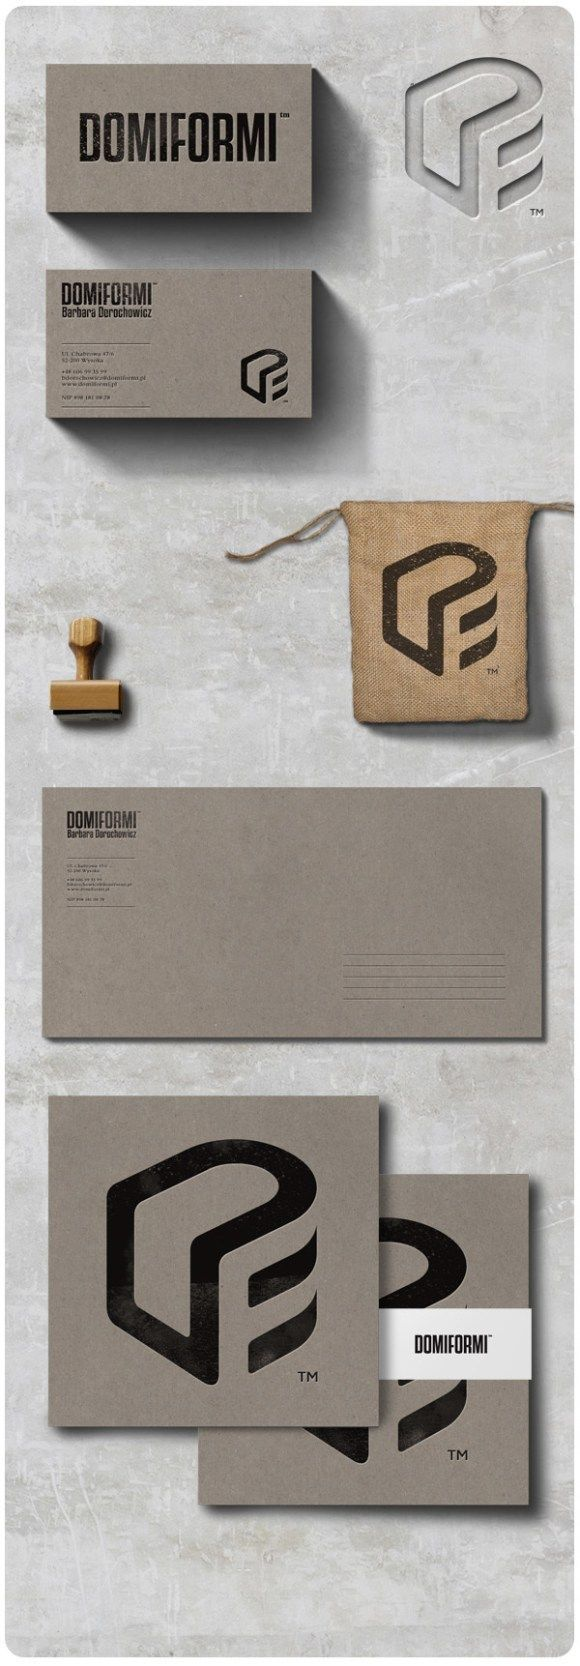 Simplistic logo inspiration - Visual identity architect 16 http://jrstudioweb.com/diseno-grafico/diseno-de-logotipos/